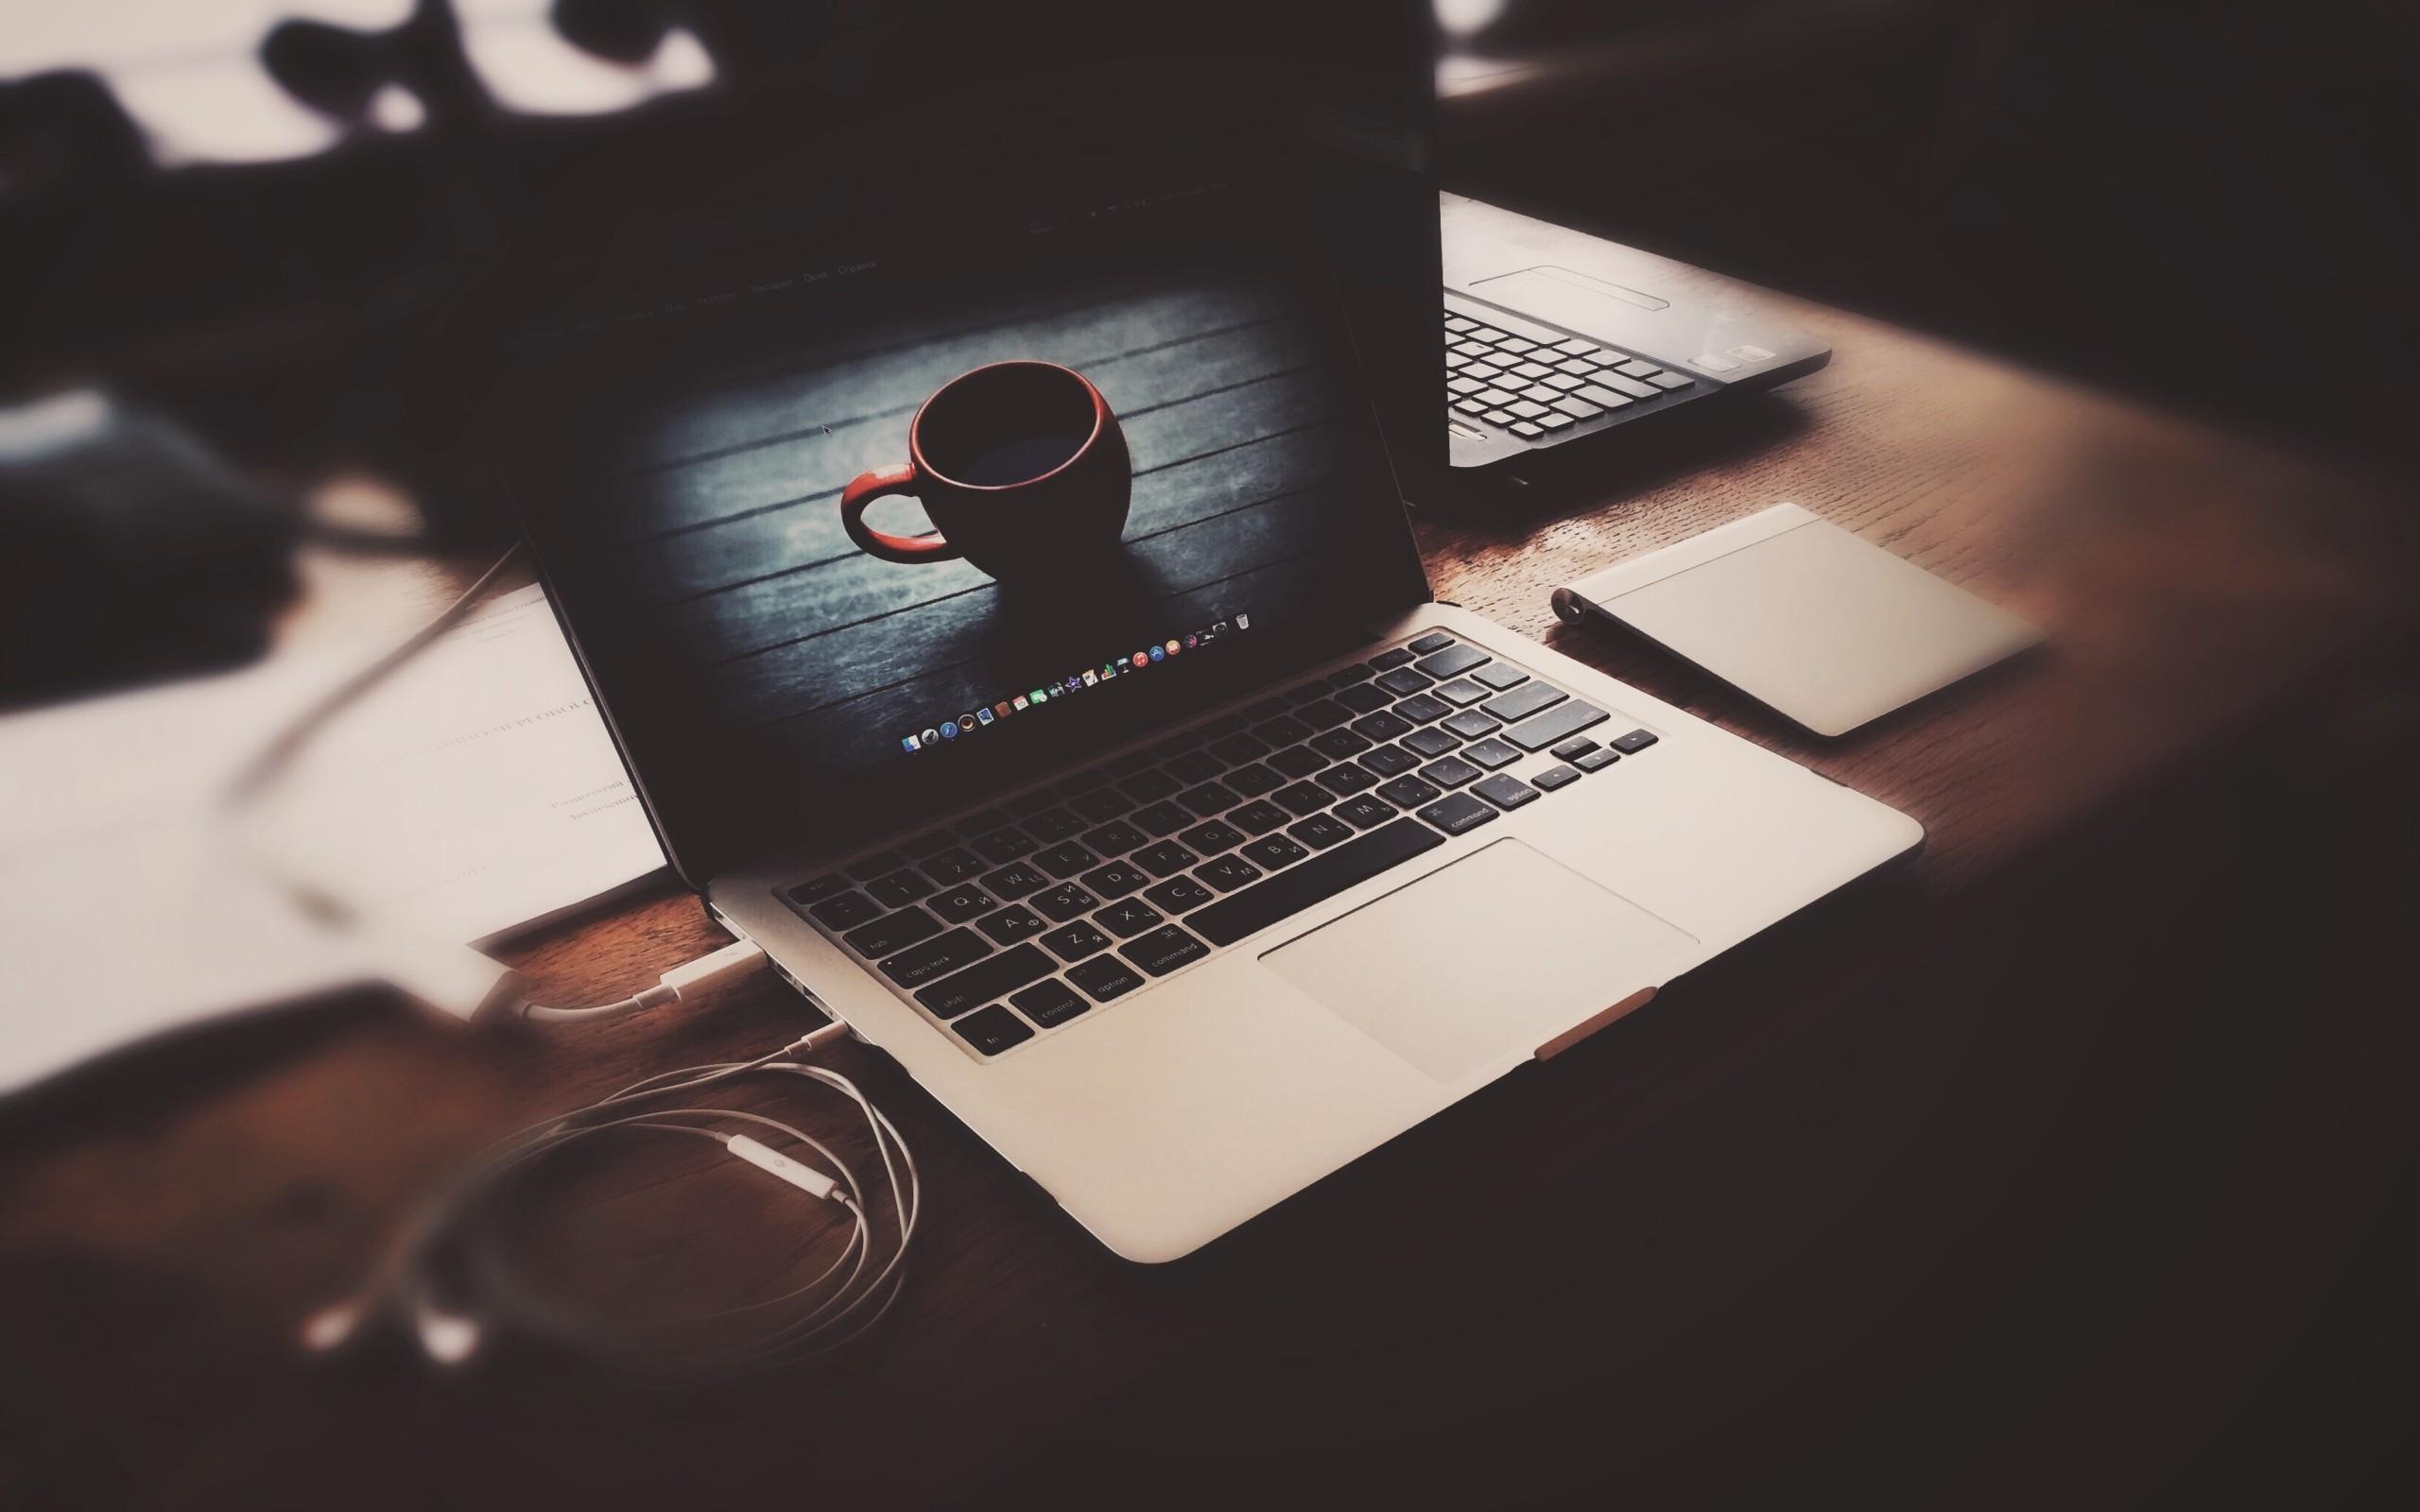 Top 10 Laptops of 2020